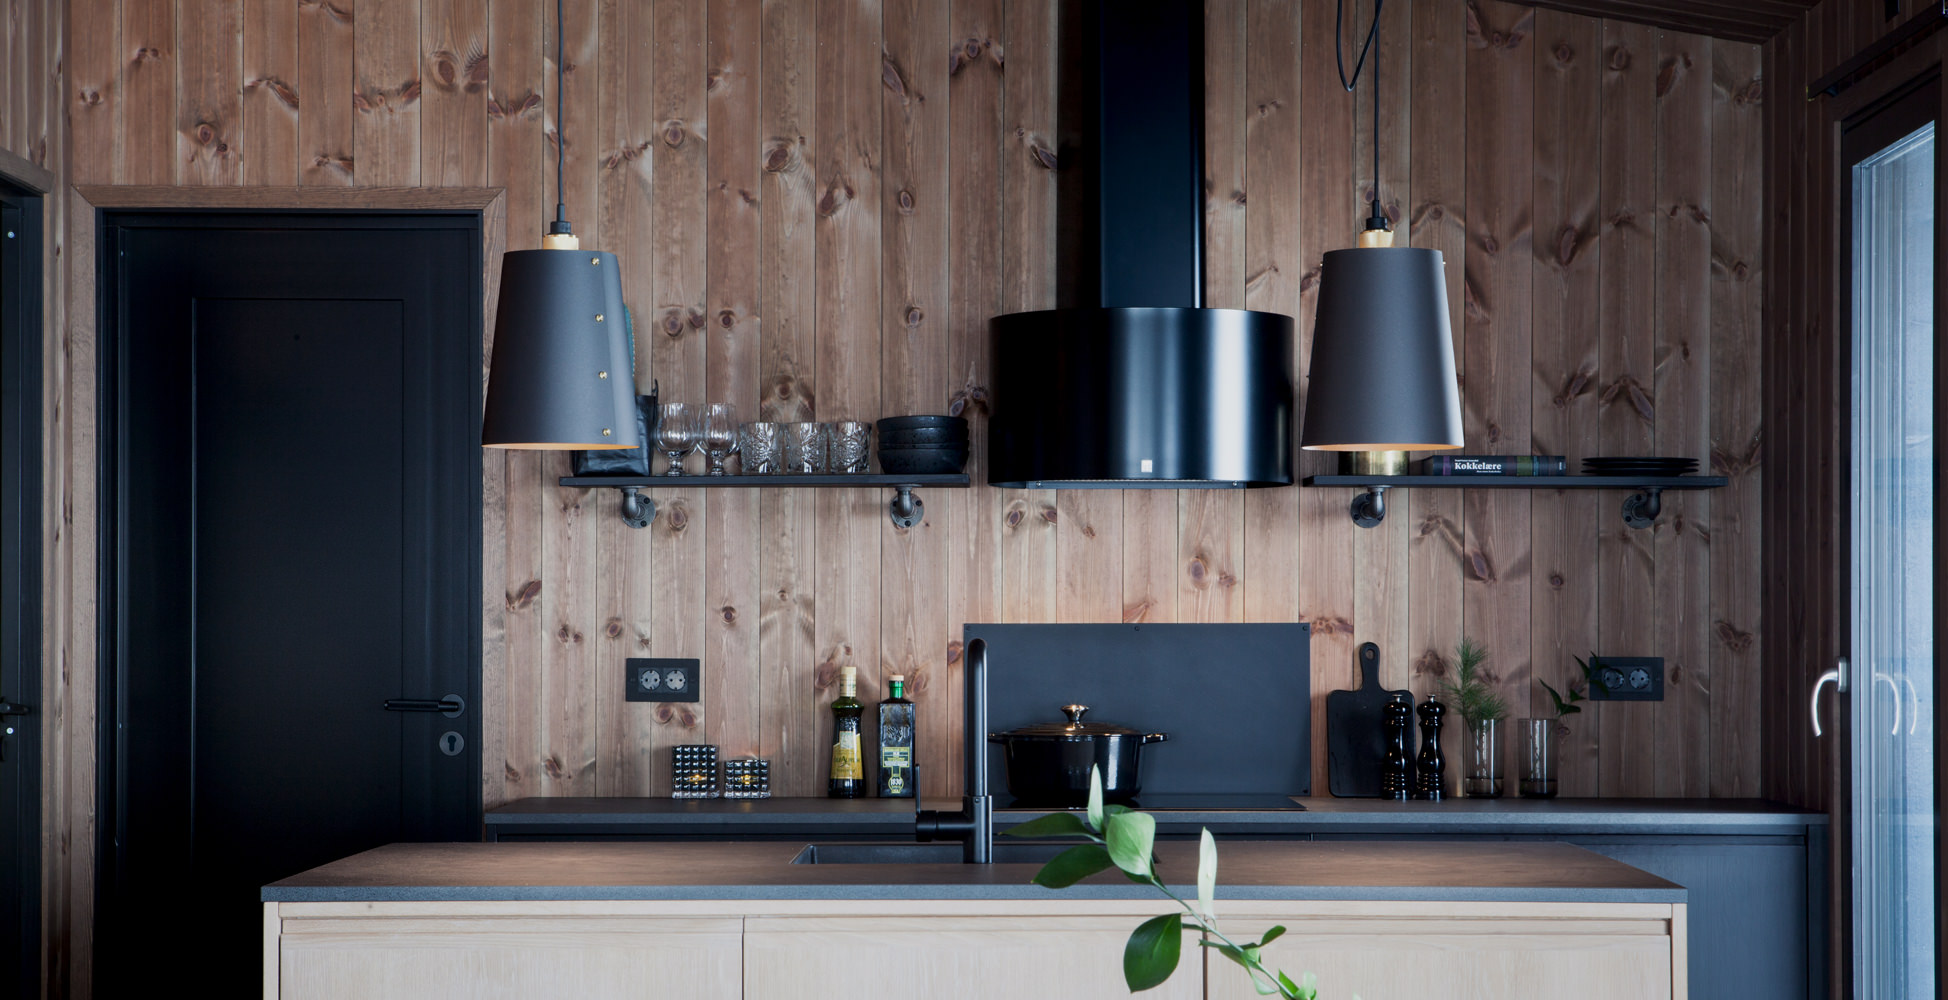 brocante lab avis interior instadaily instagram instagood brocante brocantelab charme france. Black Bedroom Furniture Sets. Home Design Ideas